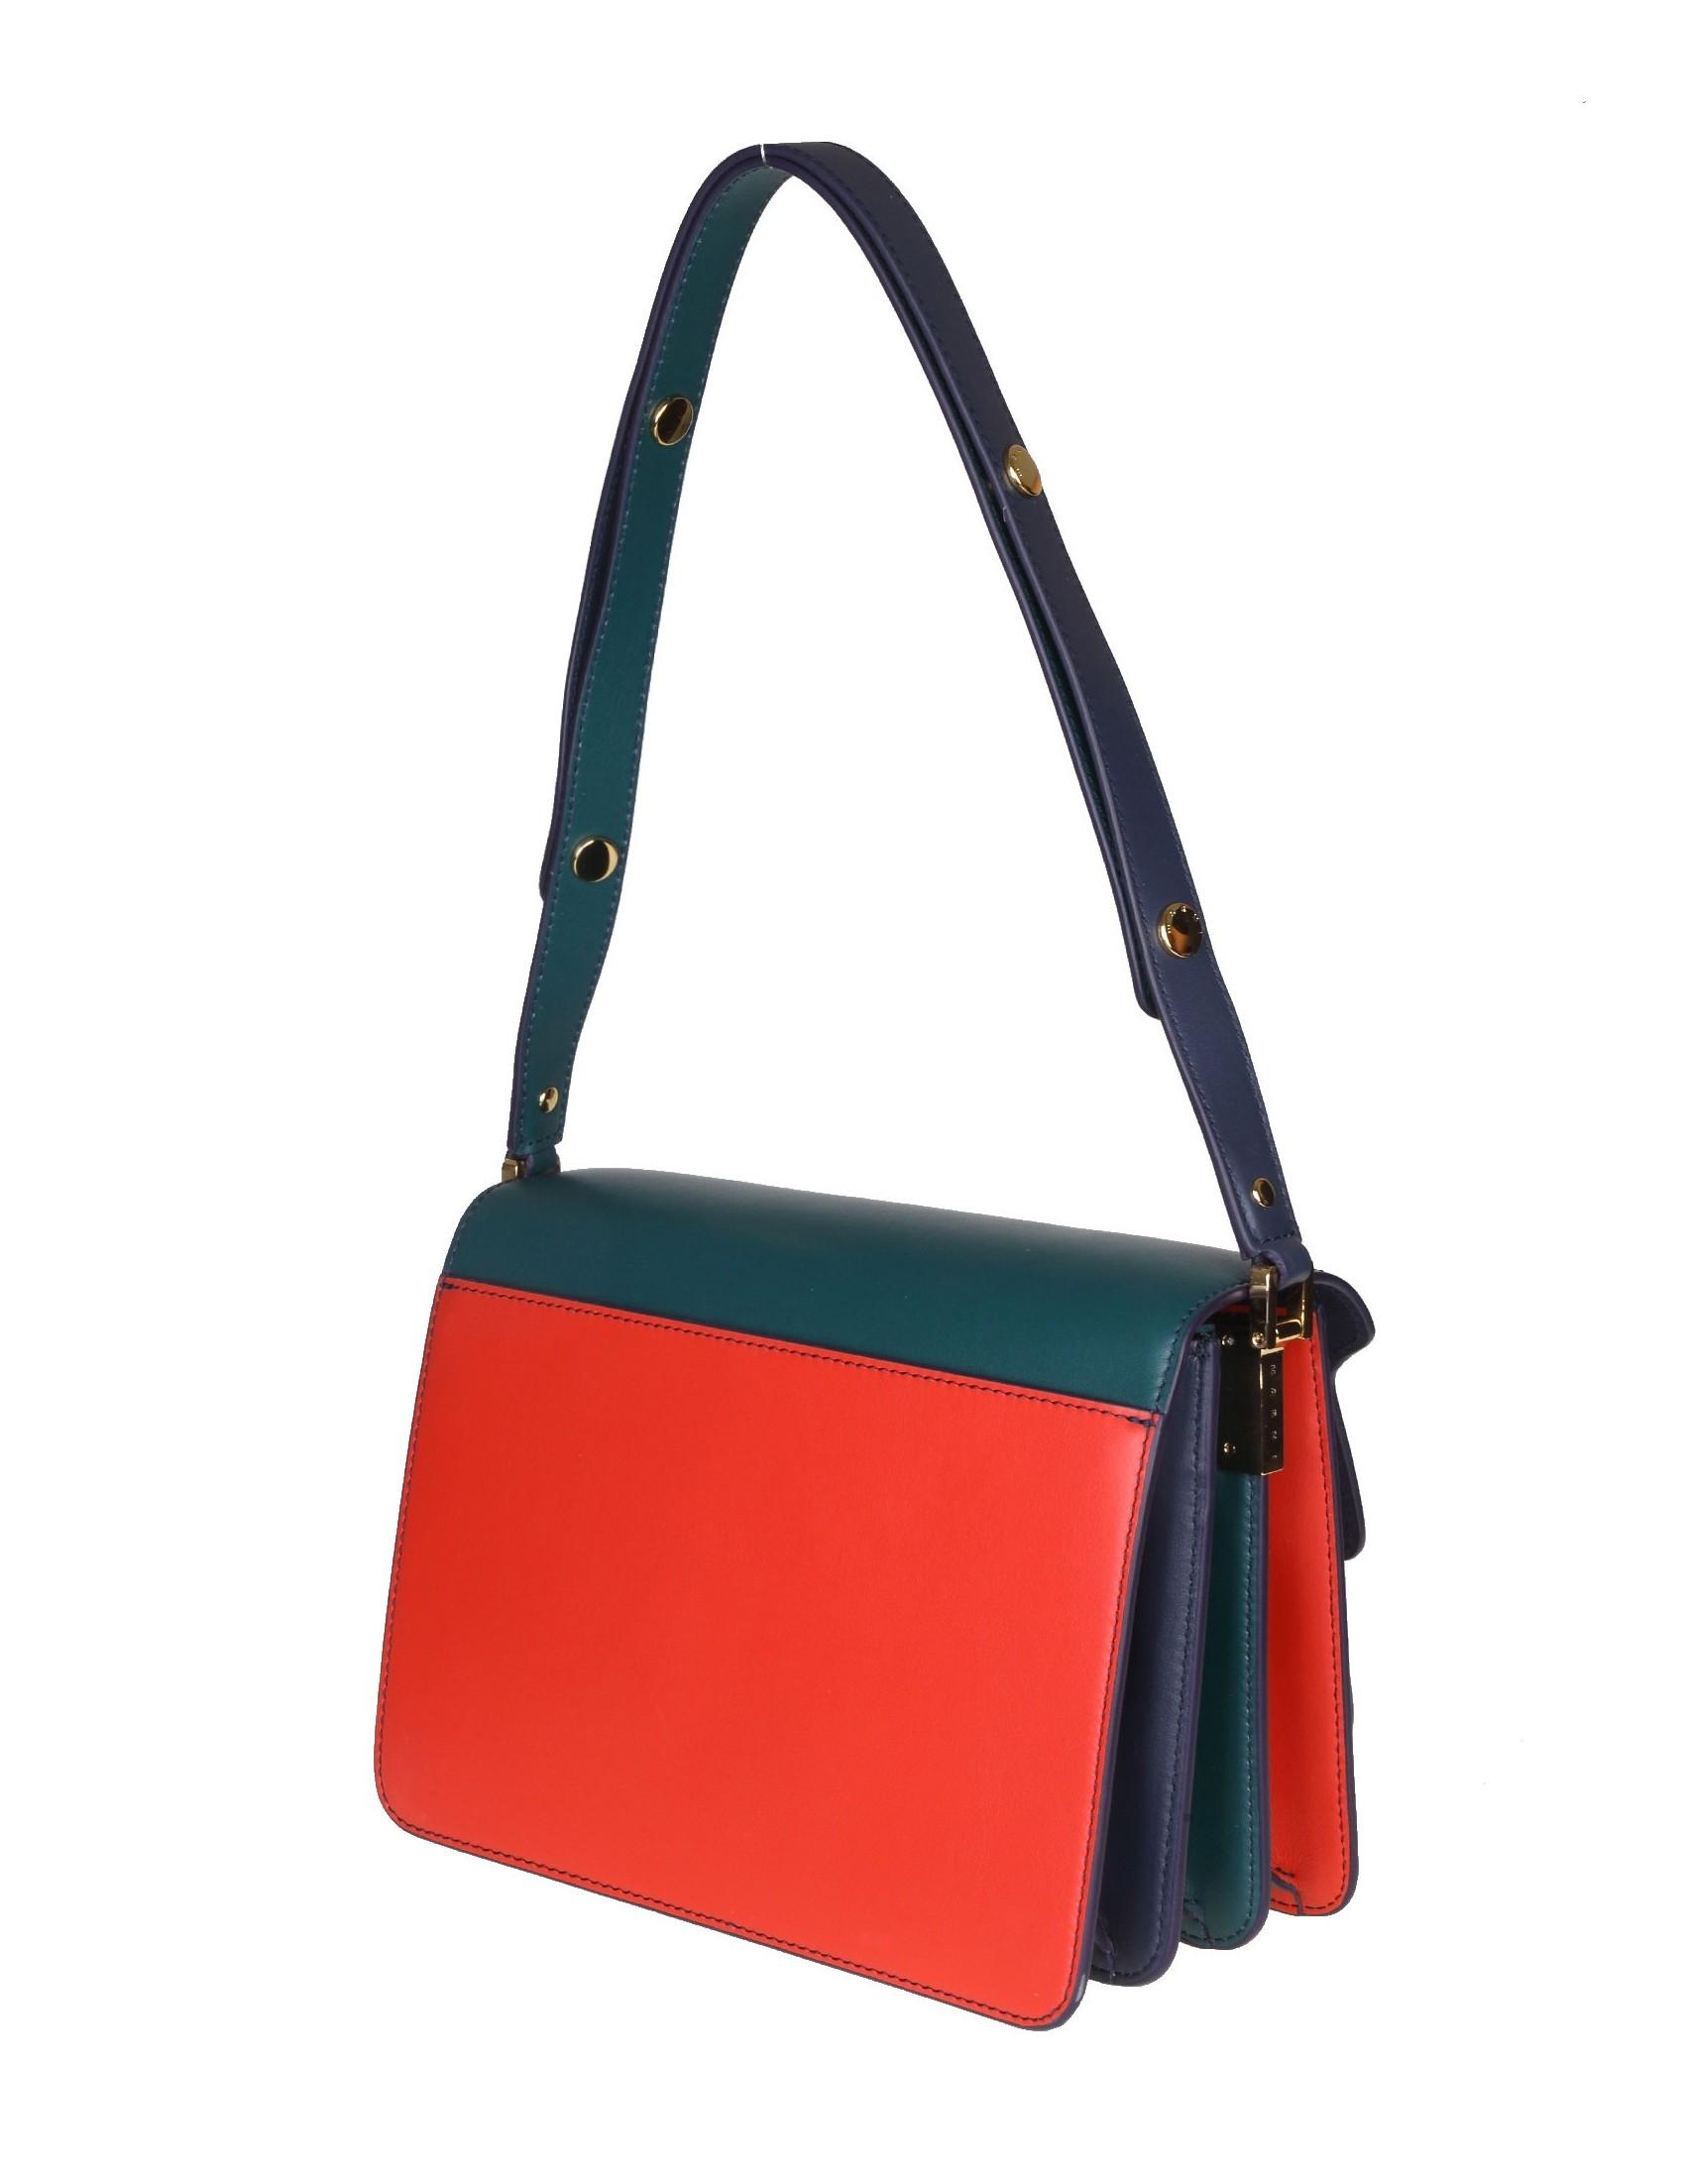 bcd39387325f2 marni-borsa-trunk-bag-in-pelle-colore-blu-verde-e-rossa.jpg